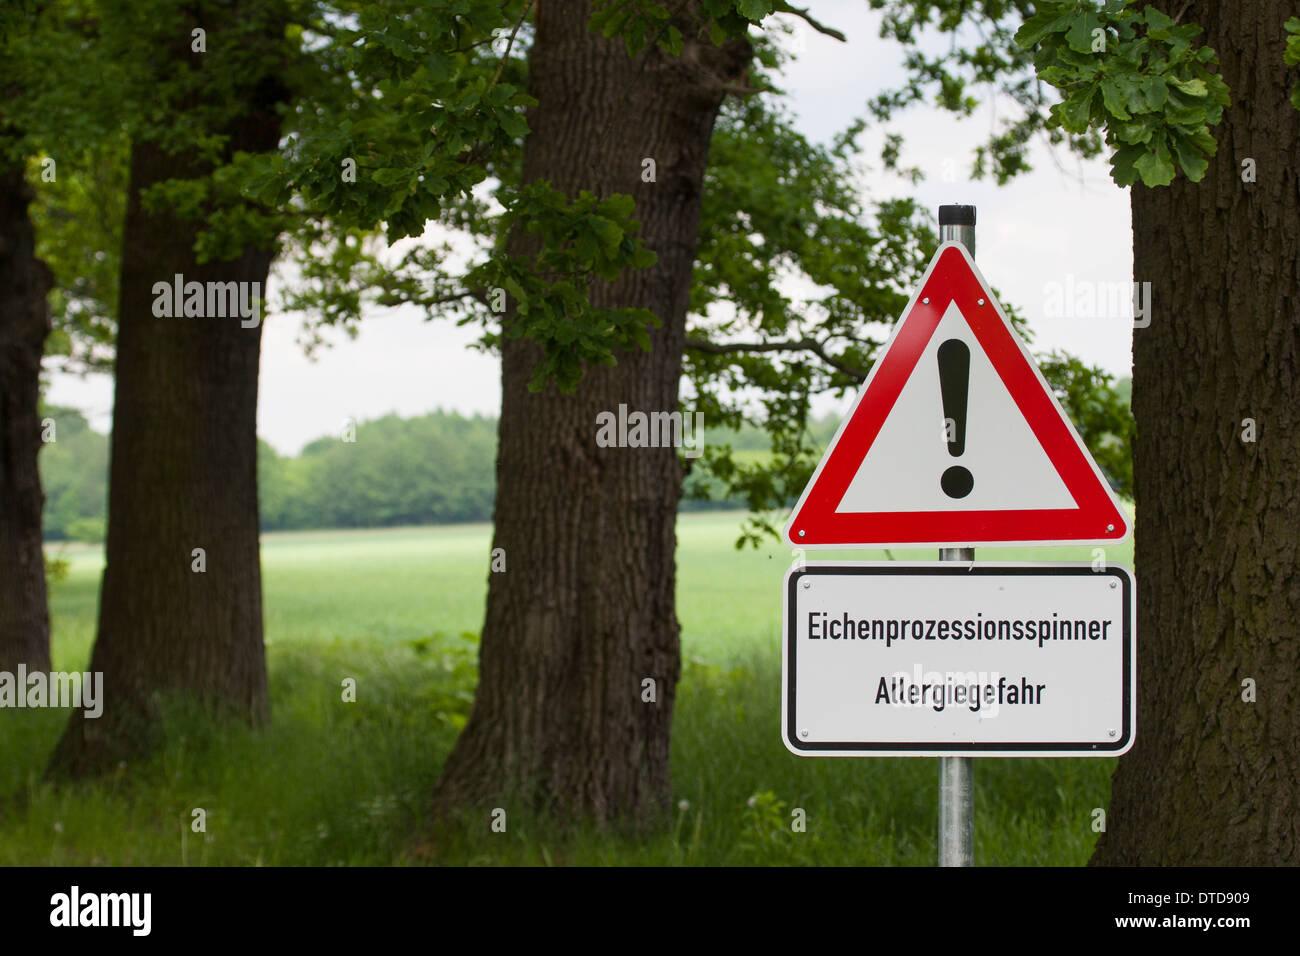 Eichen-Prozessionsspinner, Thaumetopoea processionea, oak processionary moth, Warnschild, warning, danger sign - Stock Image